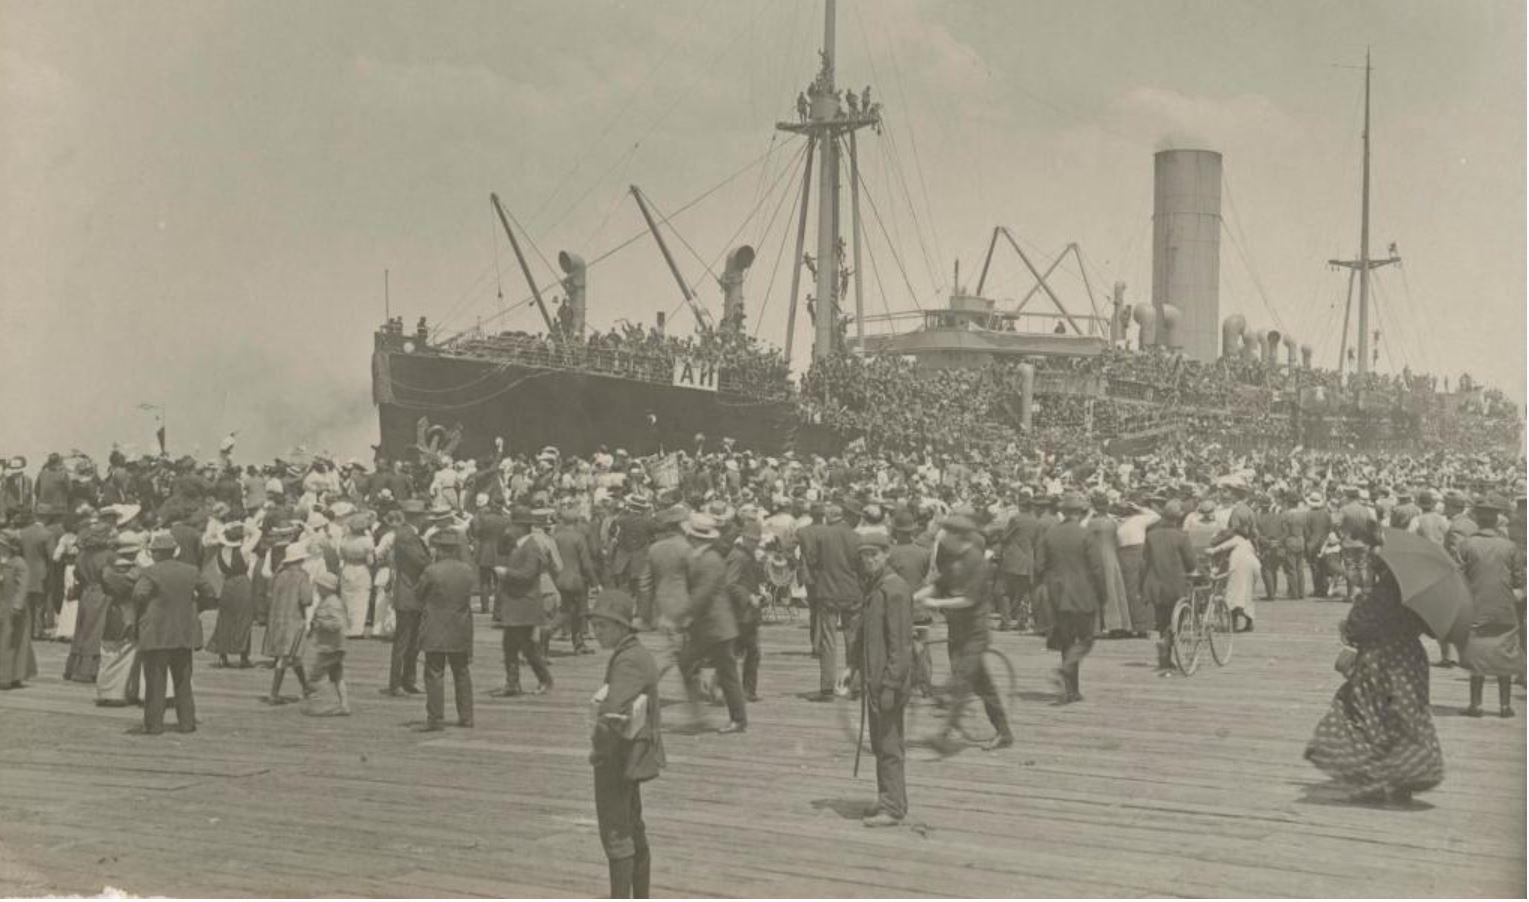 The HMAT Ascanius leaving Melbourne in November, 1915. Photo courtesy of the Australian National Maritime Museum.